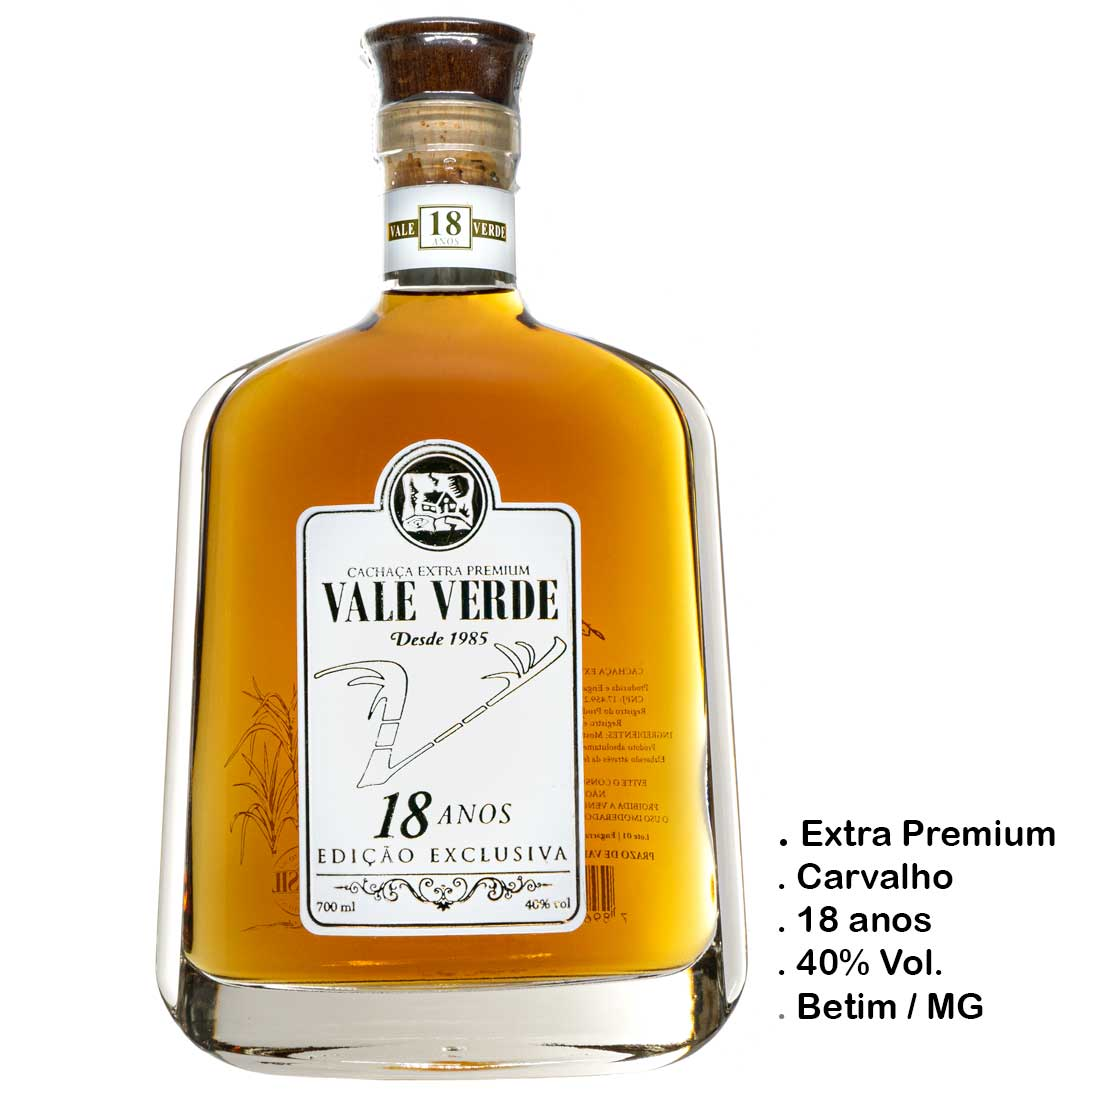 Cachaça Vale Verde Extra Premium 18 anos (Betim - MG)